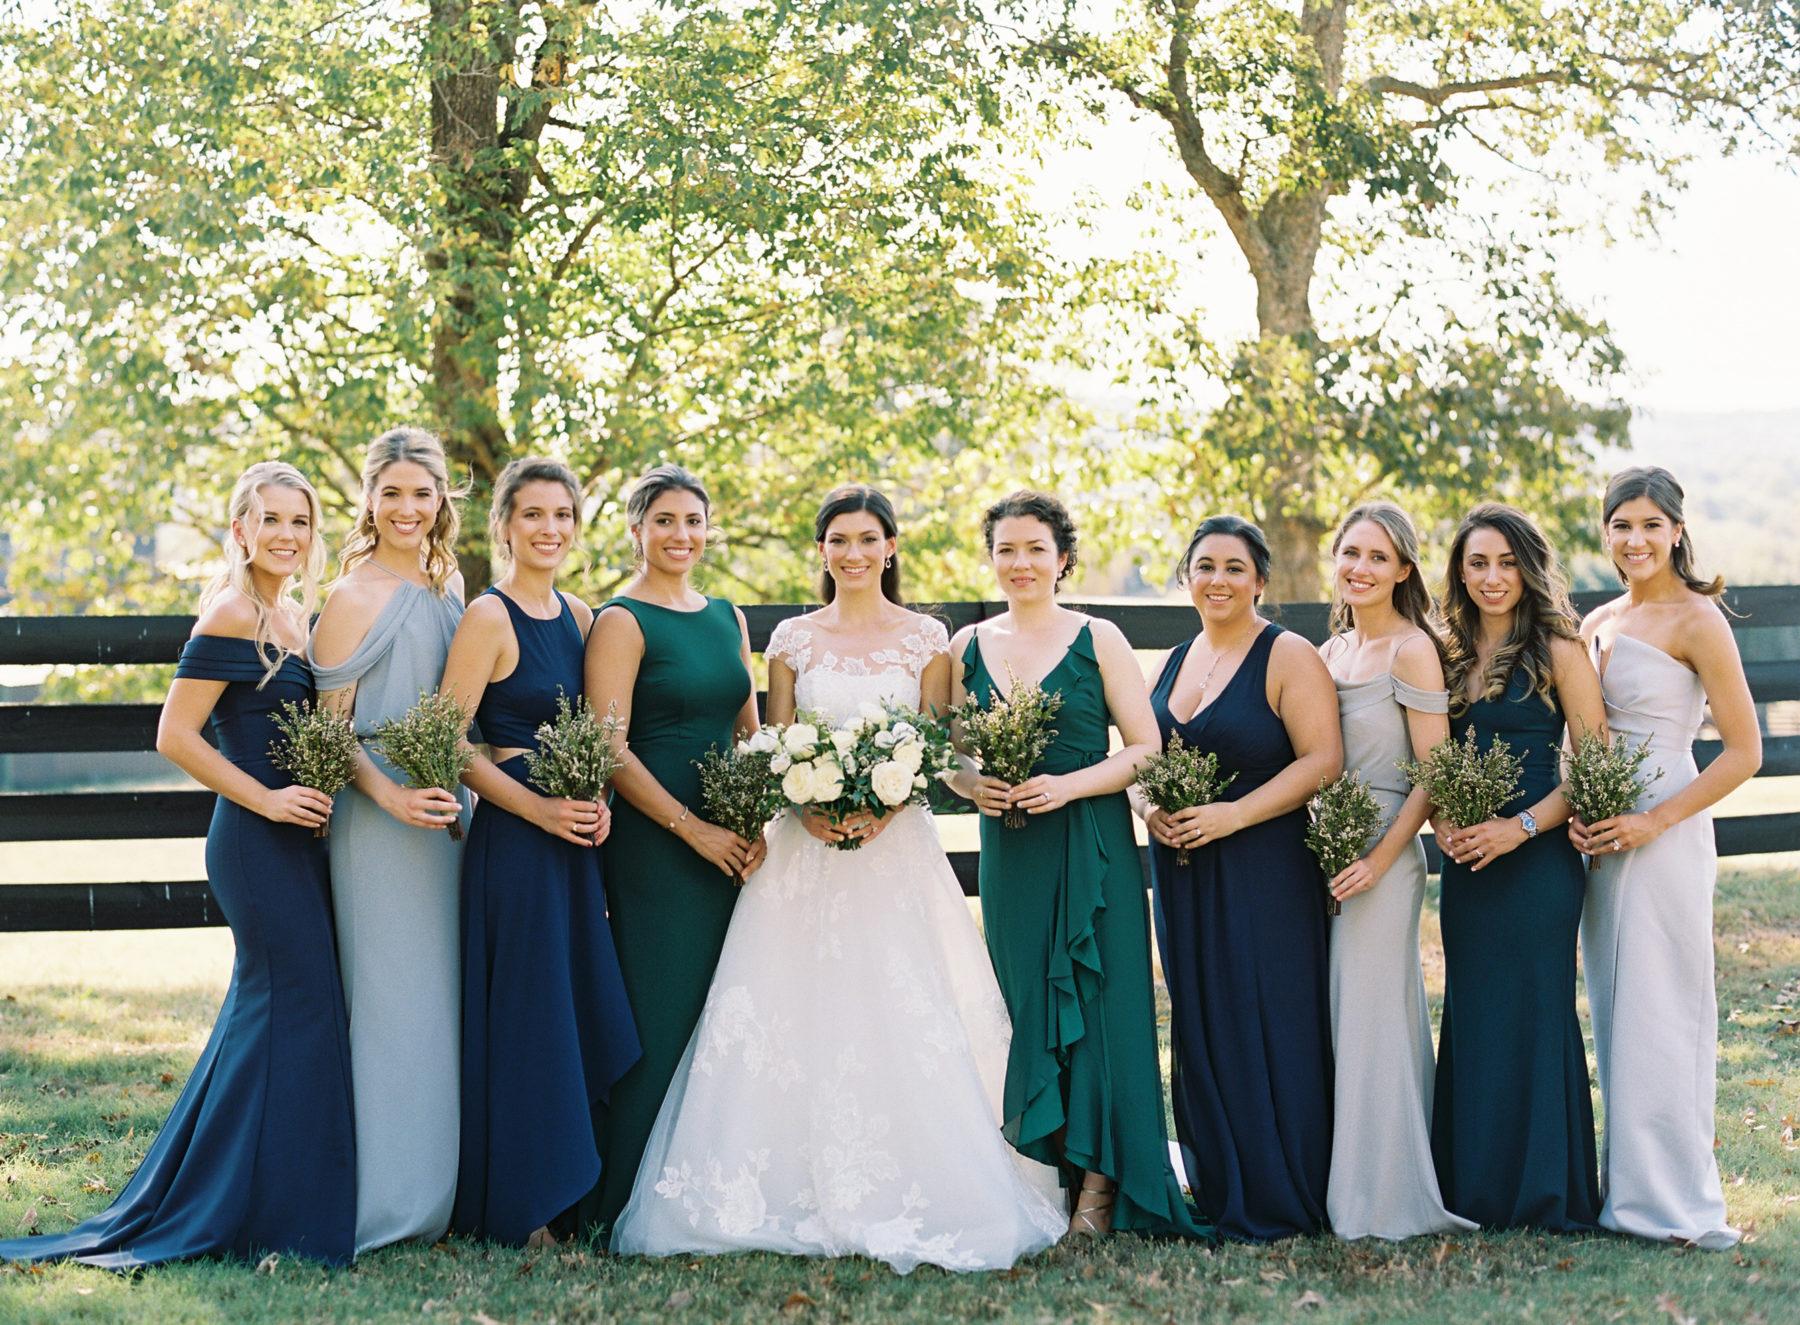 Mismatched bridesmaid dresses for fall Nashville wedding